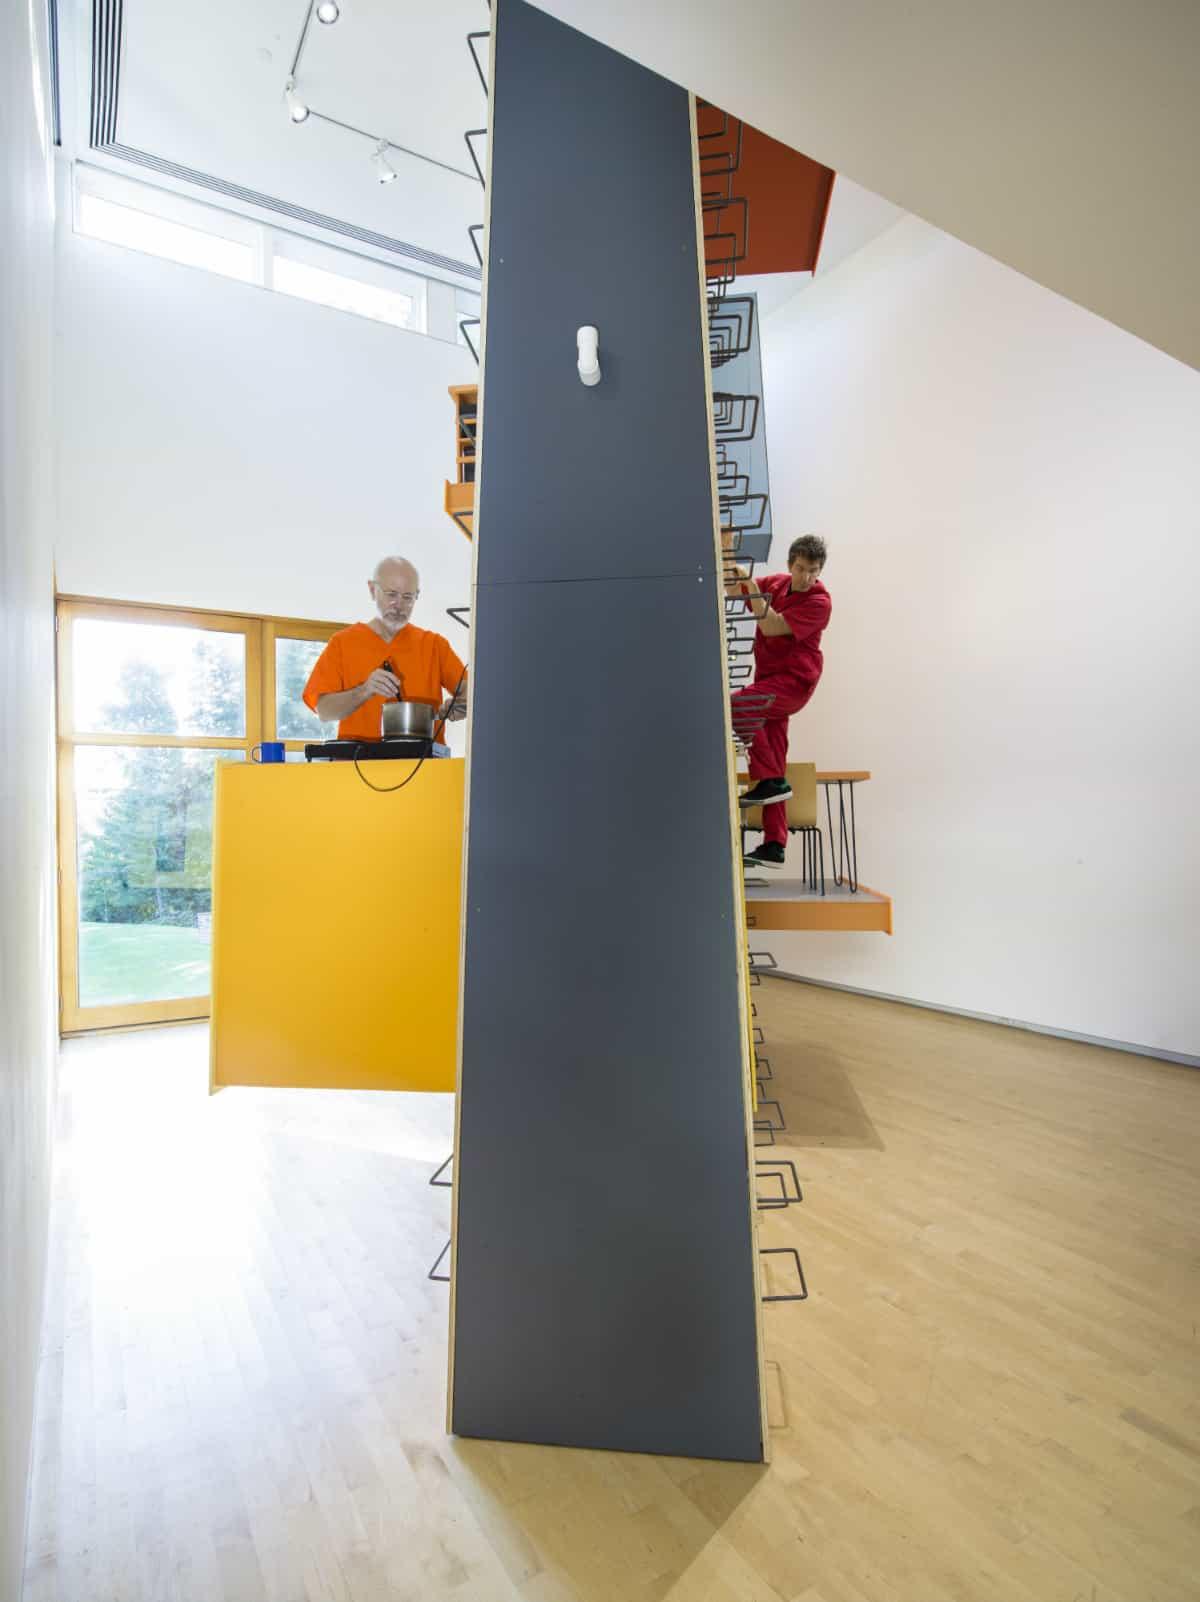 Ward Shelley, your turn, The Aldrich Contemporary Art Museum, Ridgefield, CT. Photo: Jason Mandella